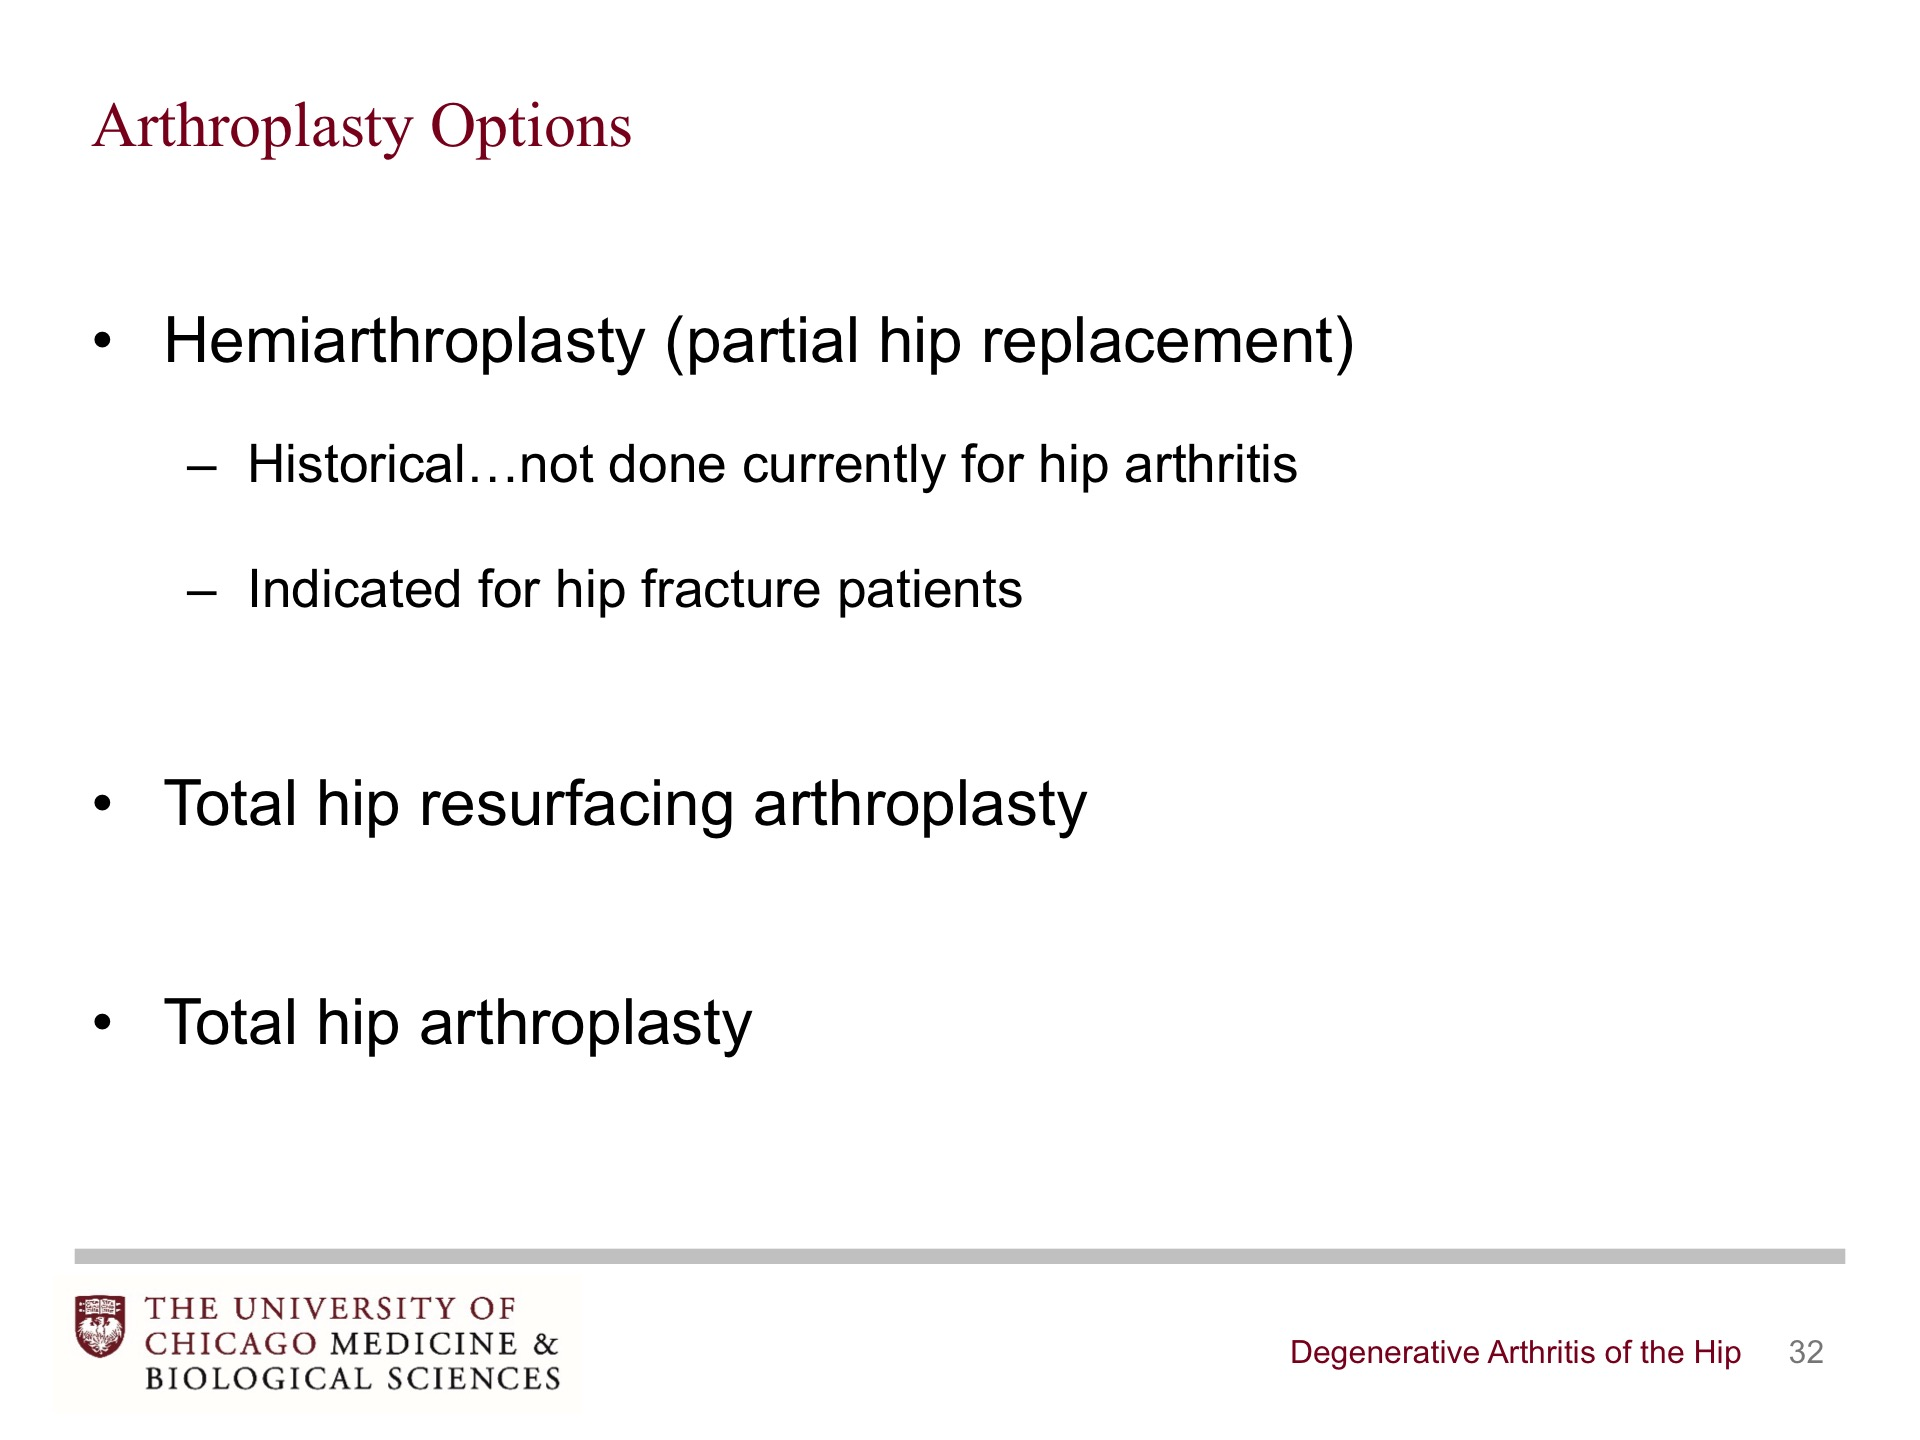 Degenerative Arthritis of the Hip - BroadcastMed